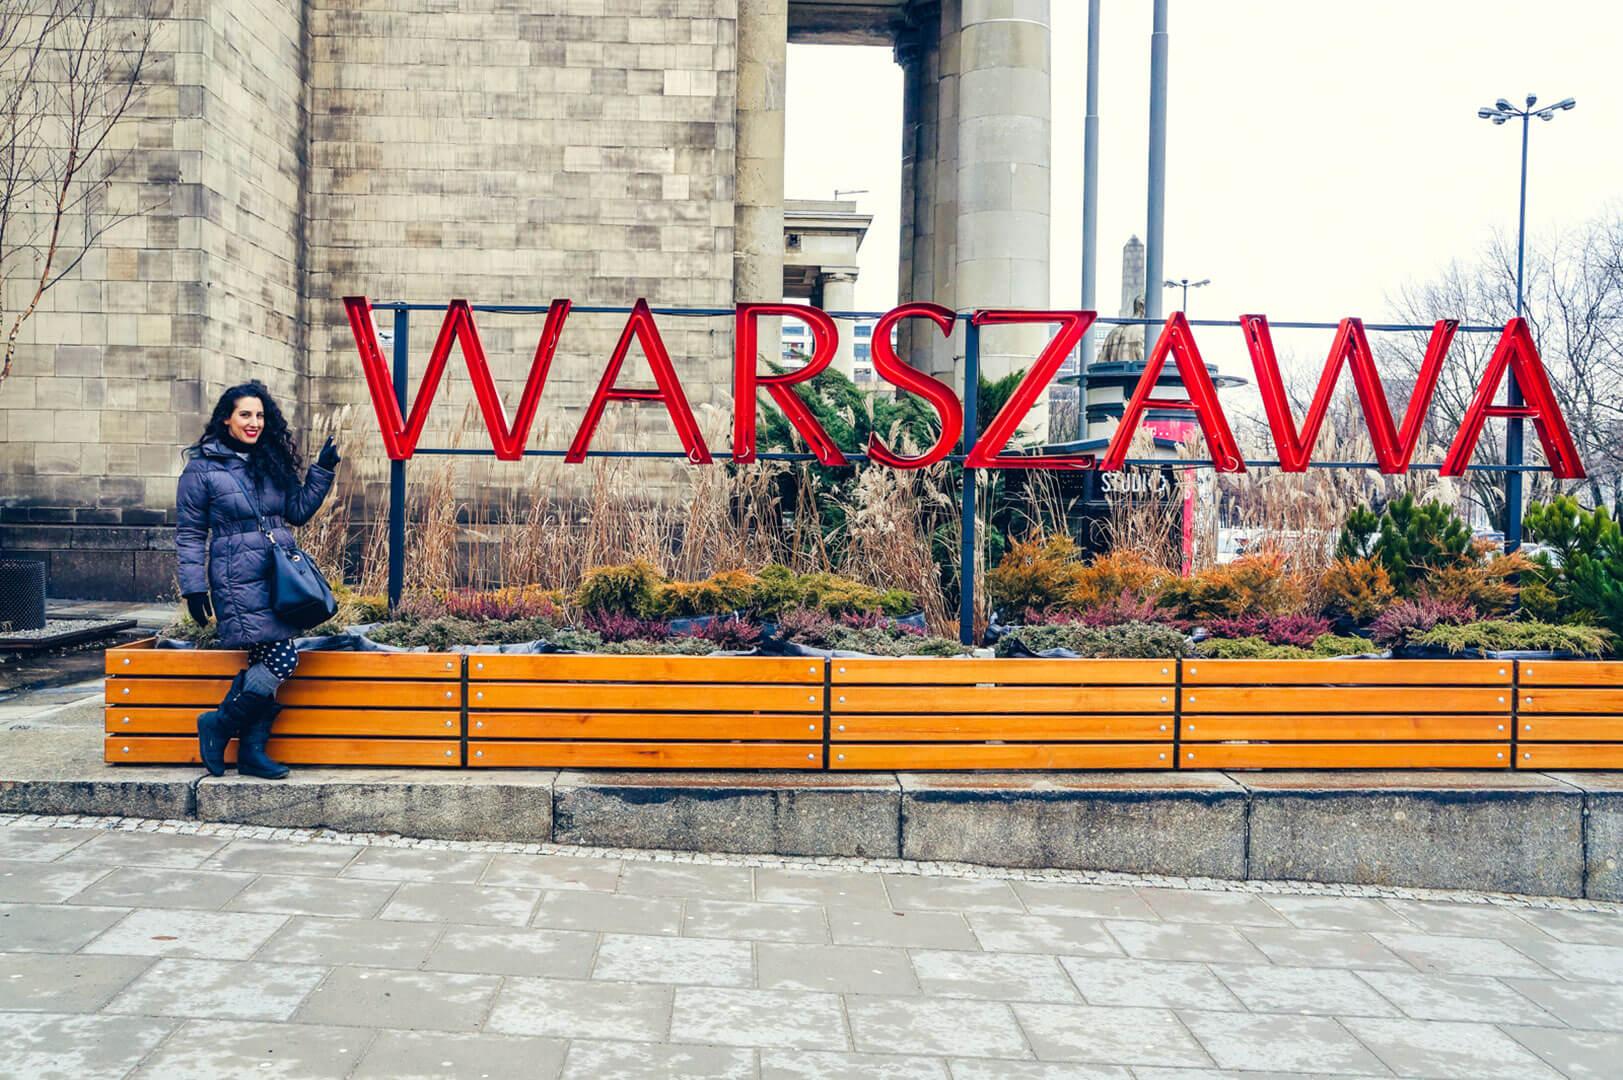 warsaw-poland-guide-la-vie-en-blog-all-rights-reserved-62